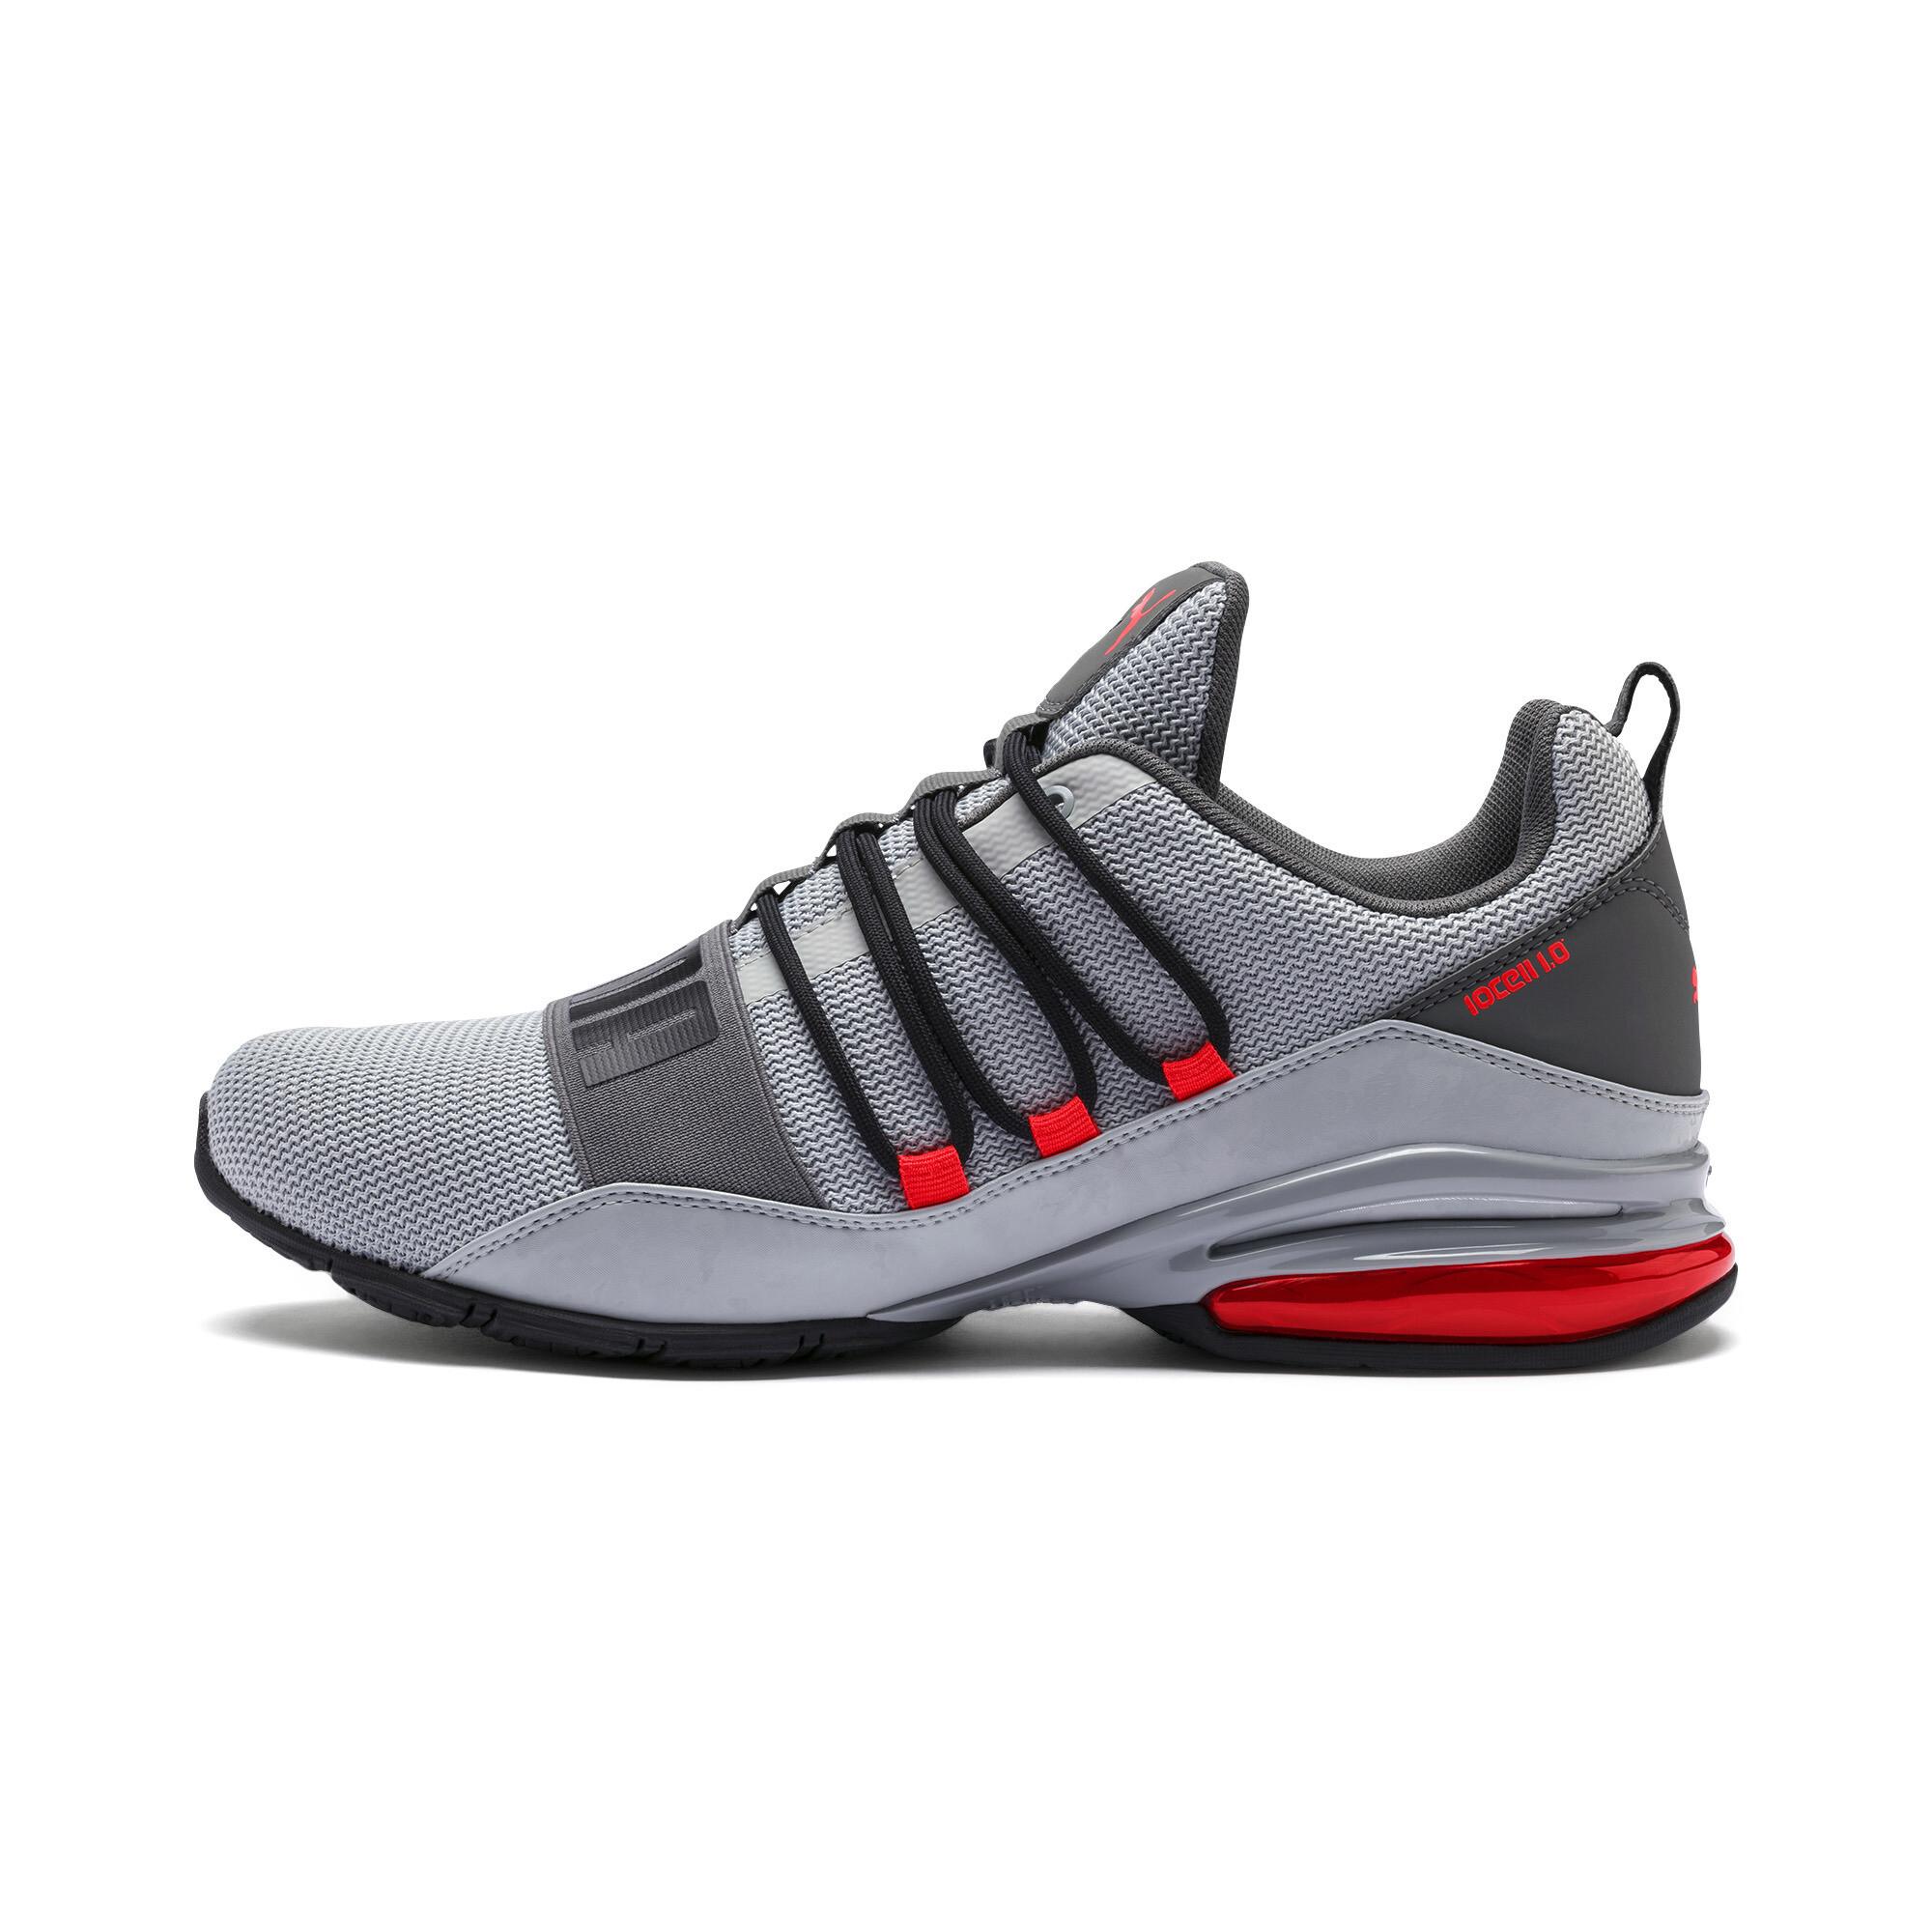 PUMA-CELL-Regulate-Camo-Men-s-Training-Shoes-Men-Shoe-Running thumbnail 4